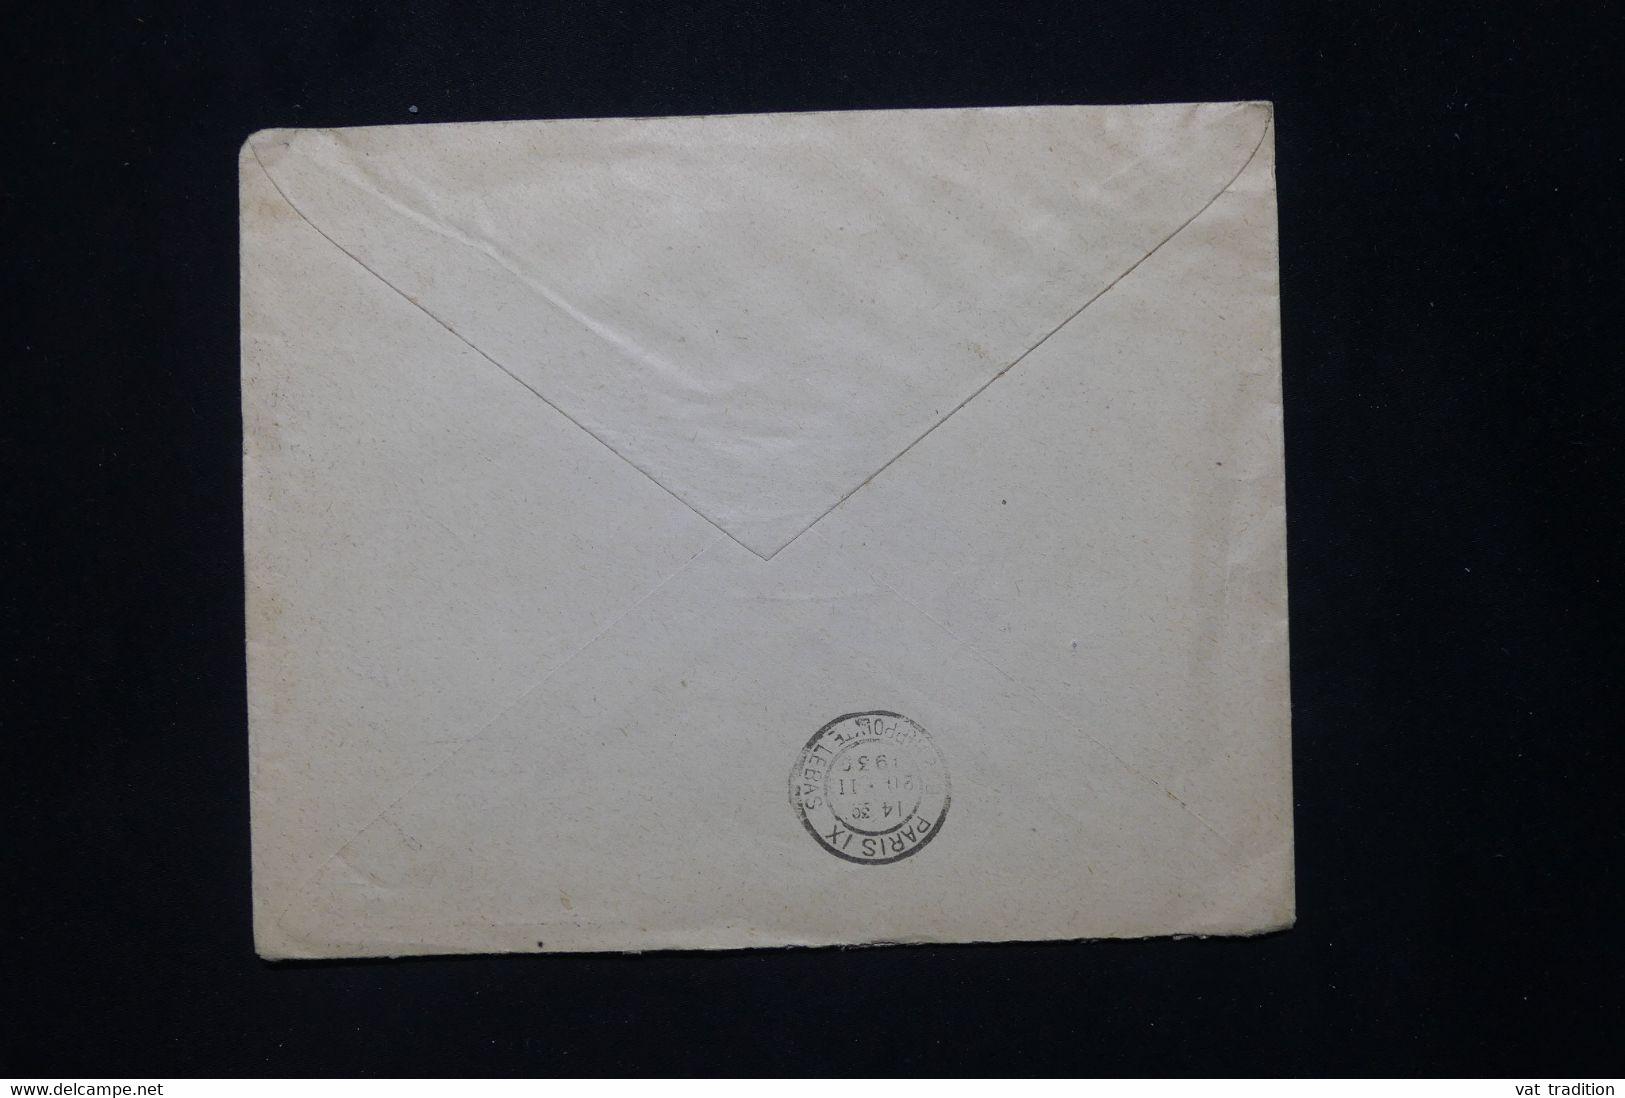 ESPAGNE - Enveloppe De Zaragoza Pour La France En 1930 - L 79892 - Cartas